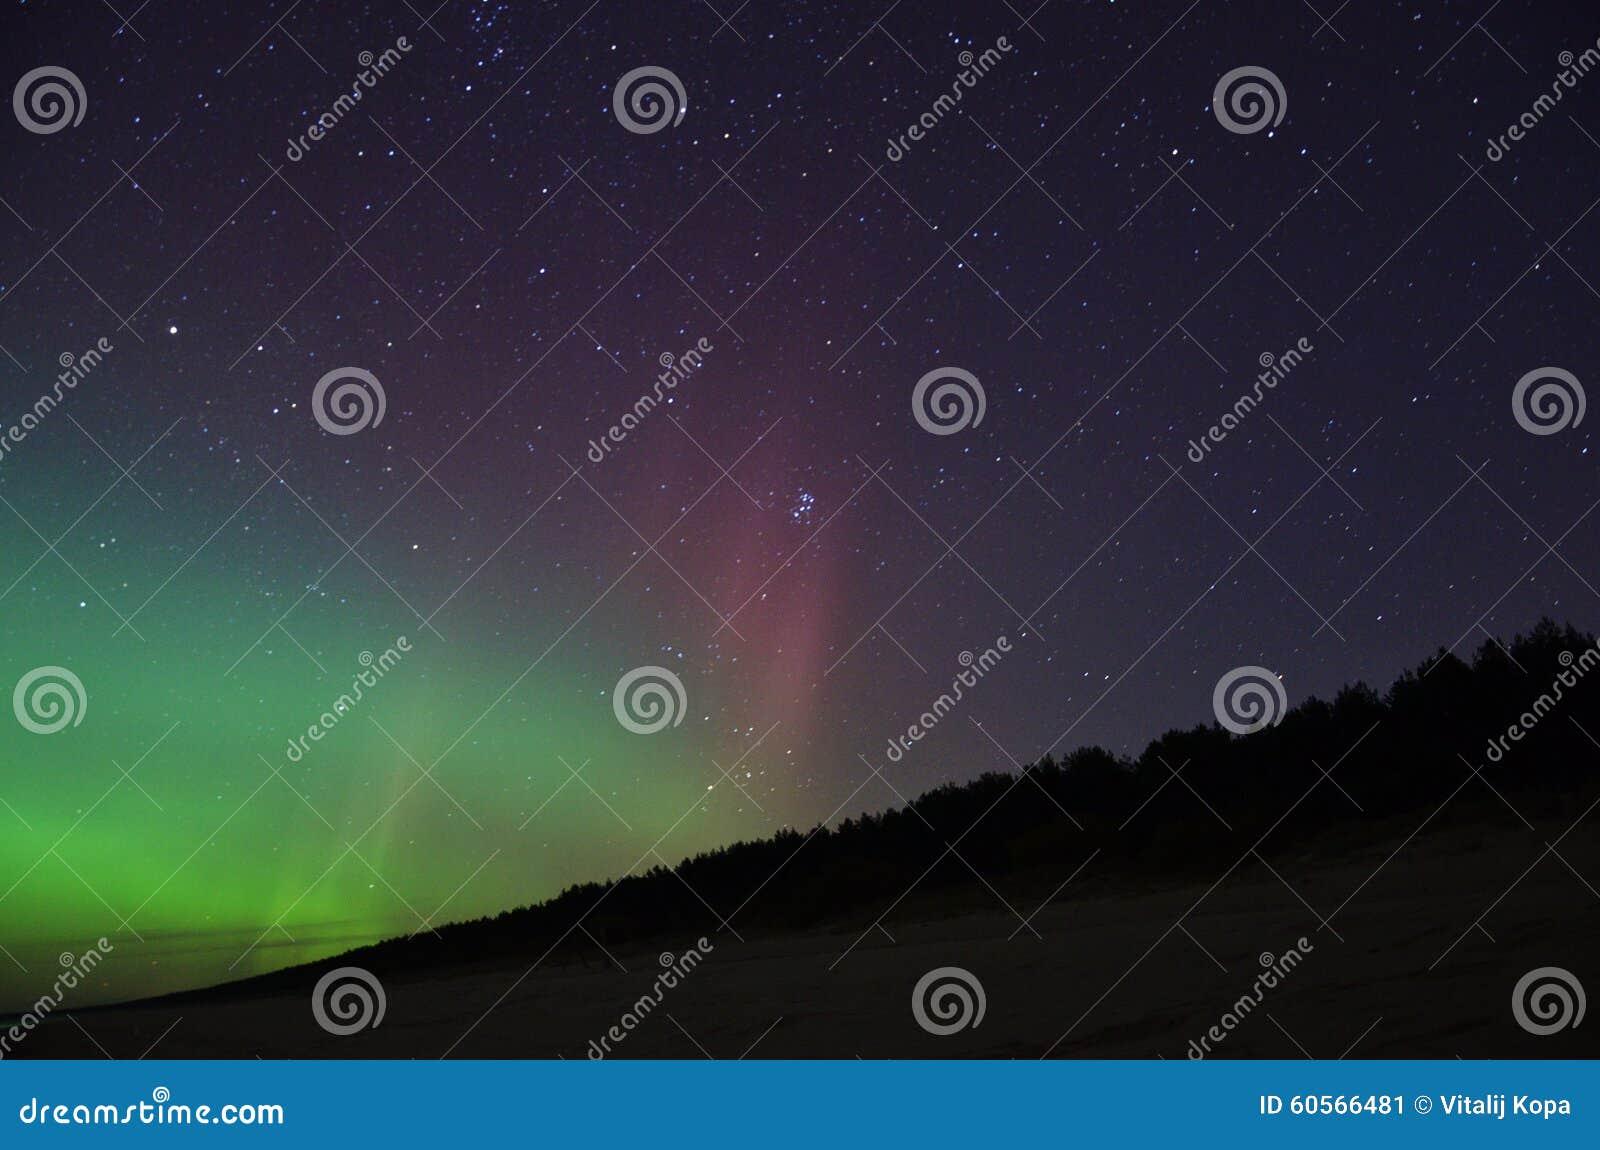 Night sky stars open cluster plaiades and aurora polar lights observation